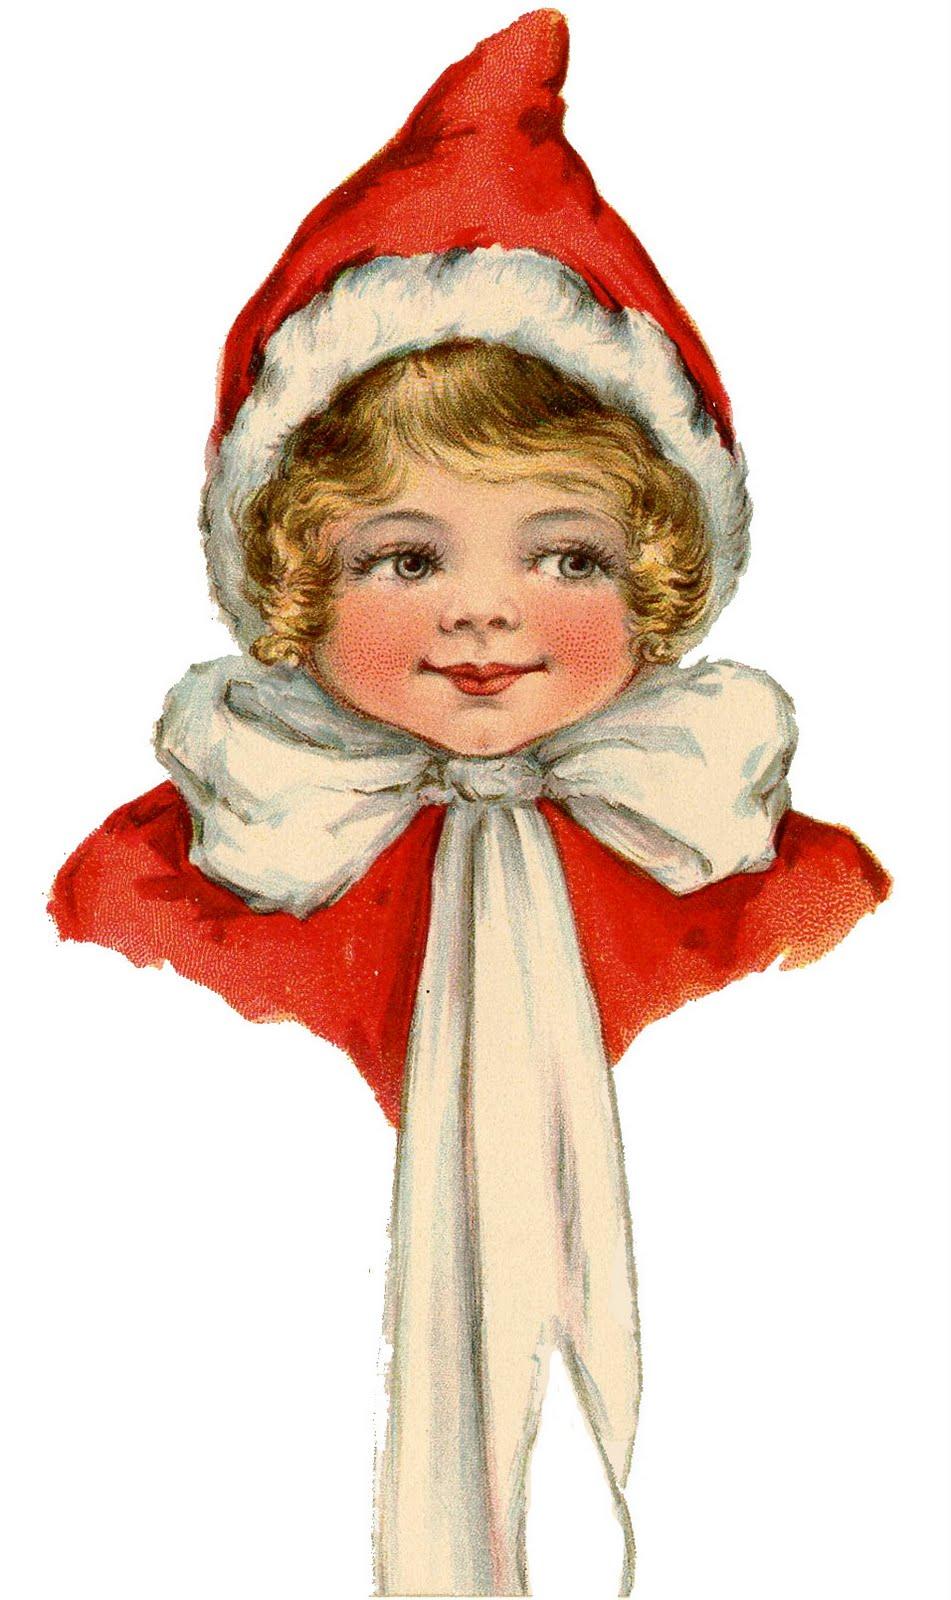 Vintage Christmas Clip Art - Adorable Elf Girl - The Graphics Fairy